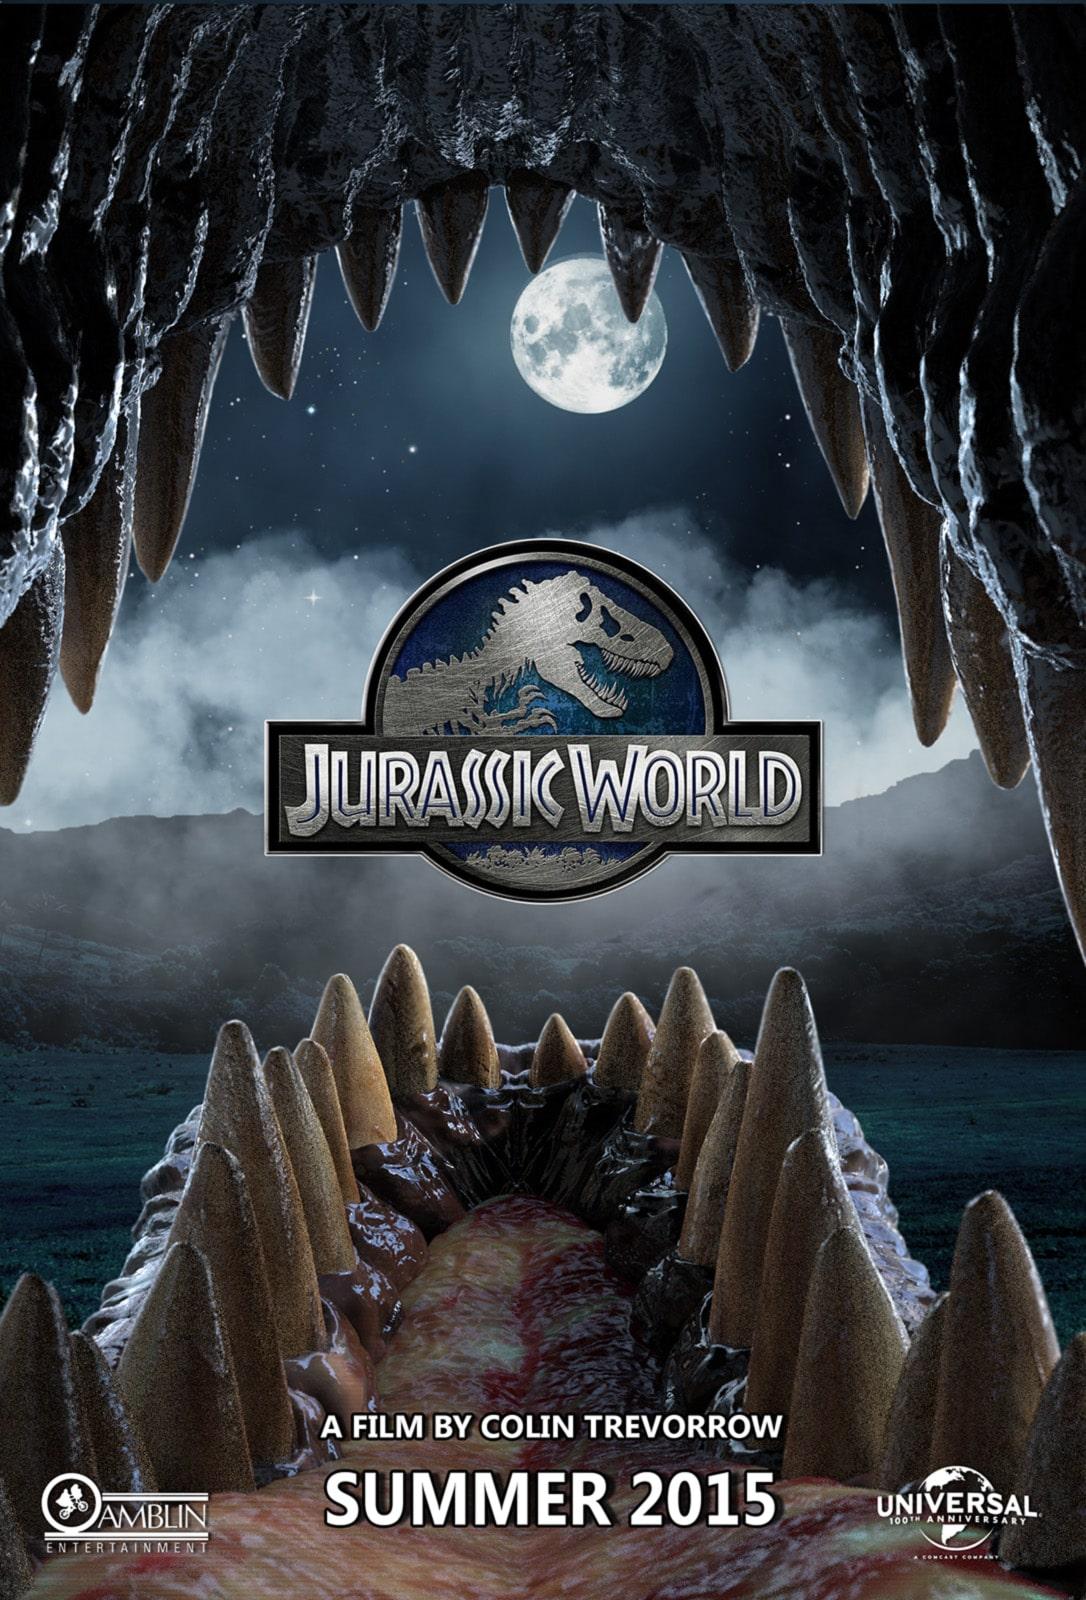 Jurassic-World-Poster-hd-printable-monster-jaws-mosasaurus